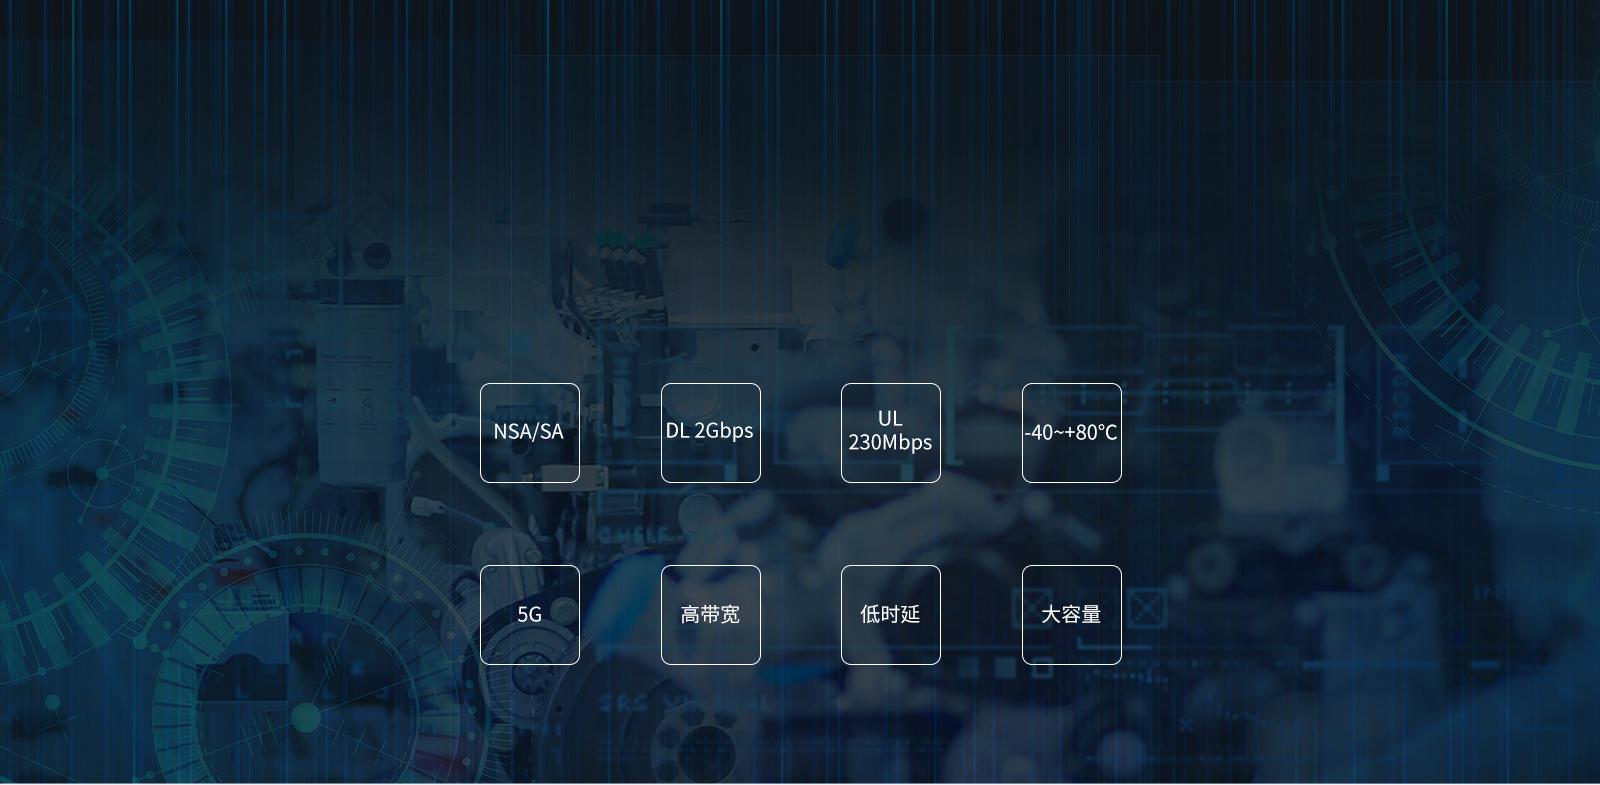 zhuan为工业huanjing打造的5G工业网关